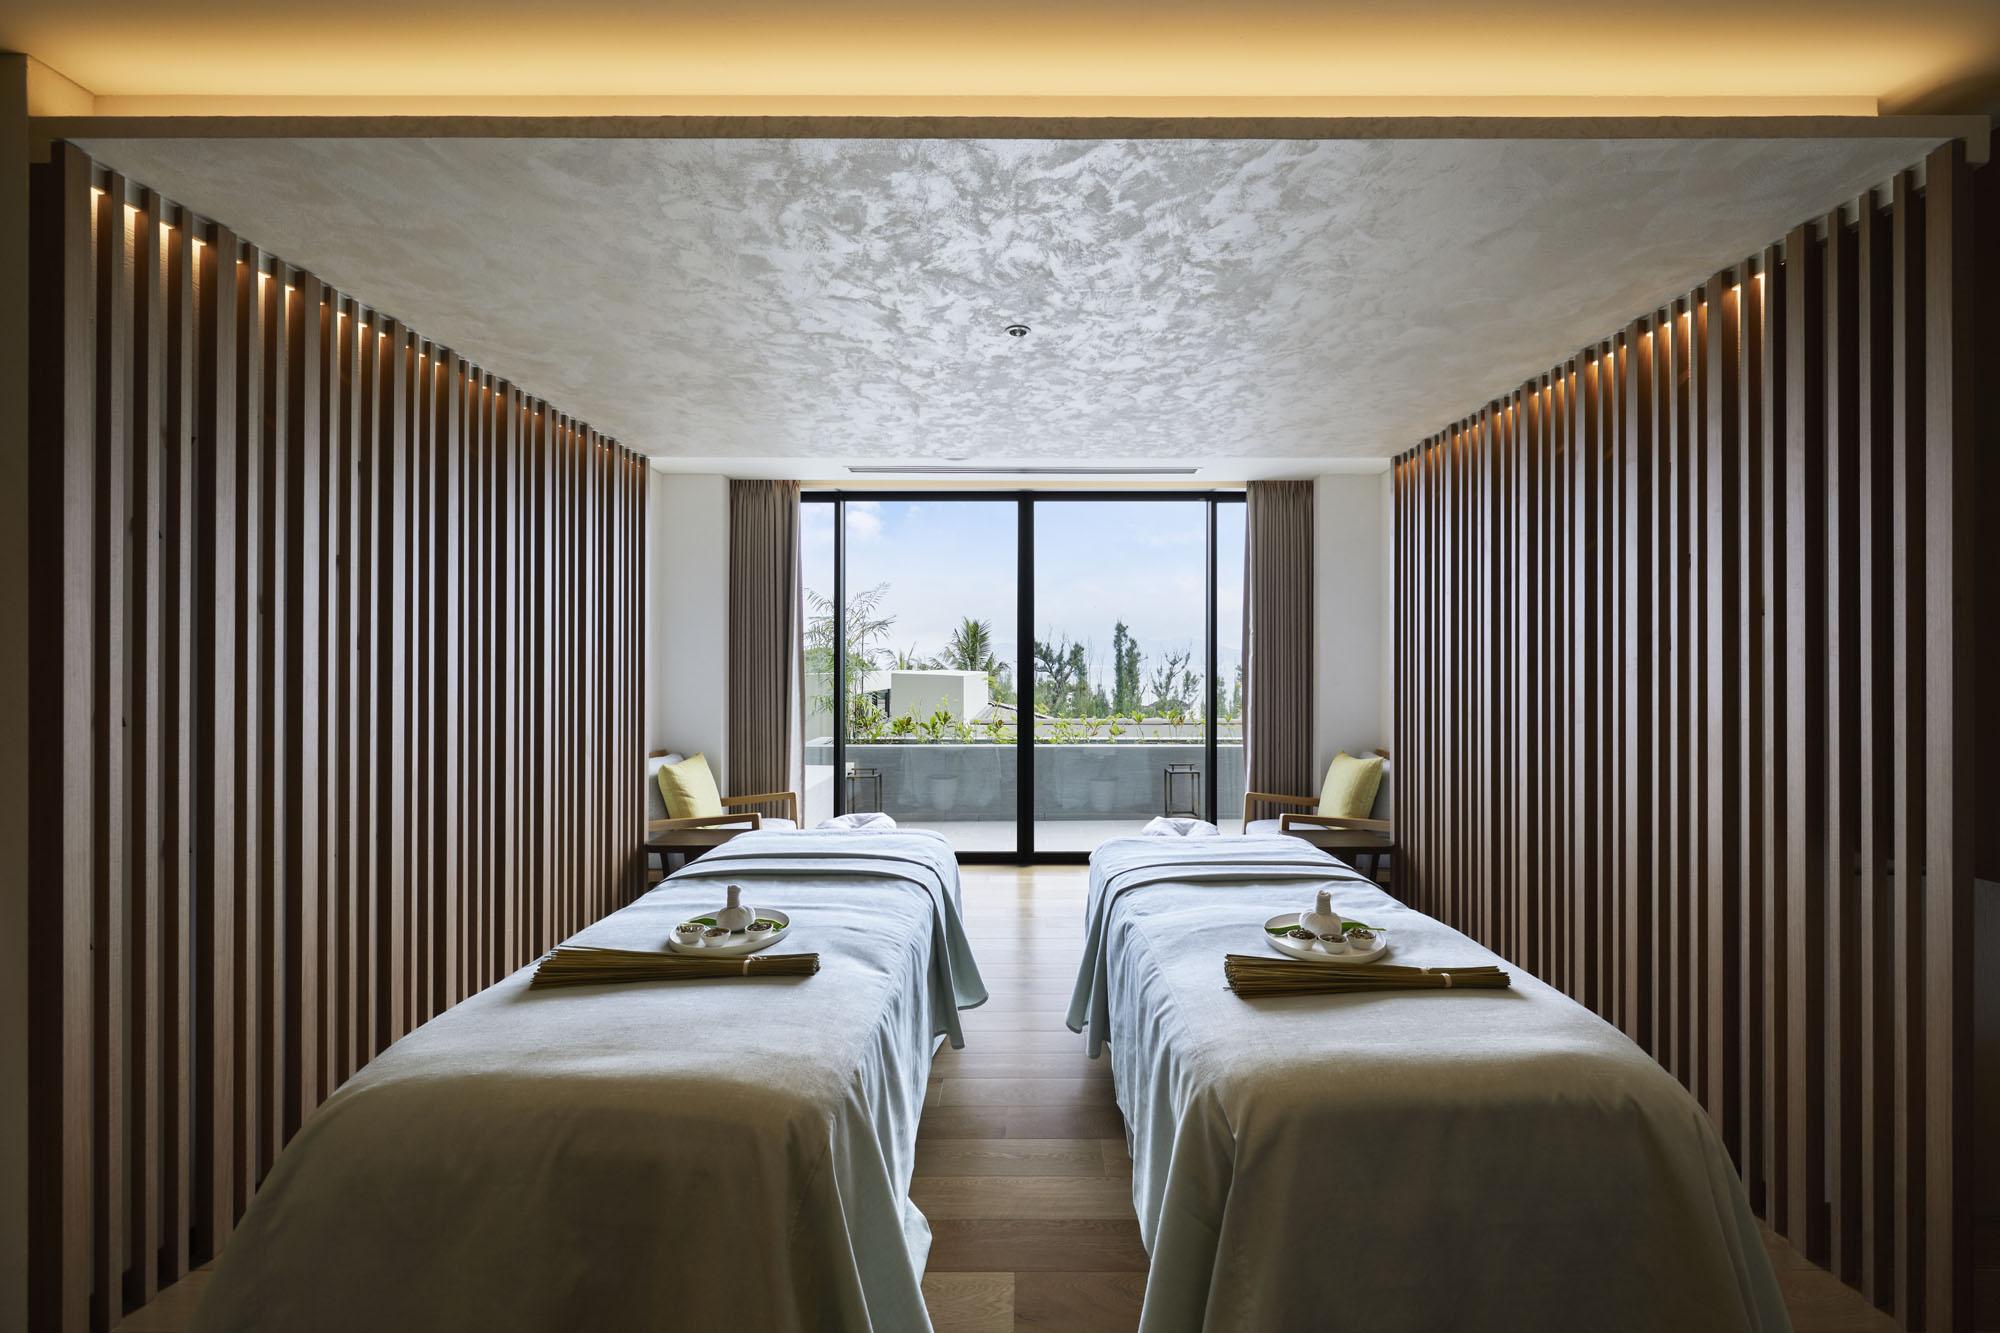 Couple's Treatment Room Nacása & Partners Inc.